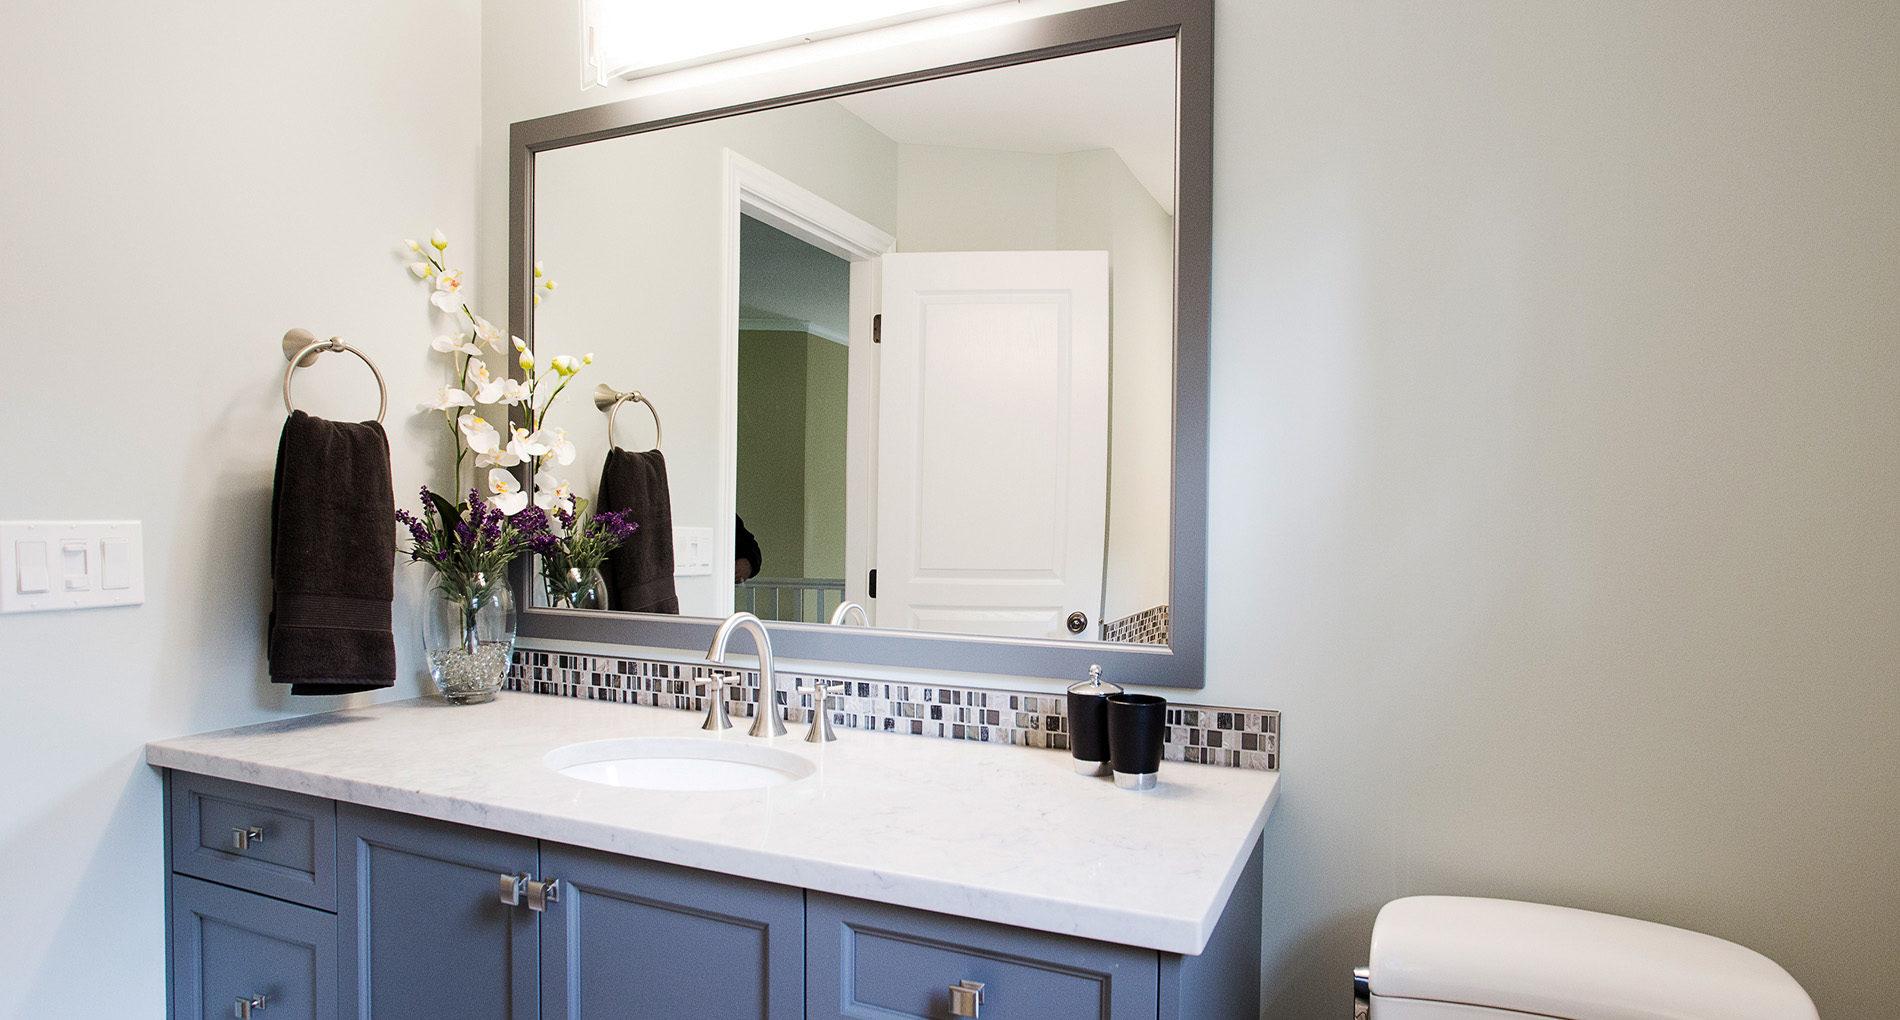 Bathroom Renovation Delta Commodore Slider1